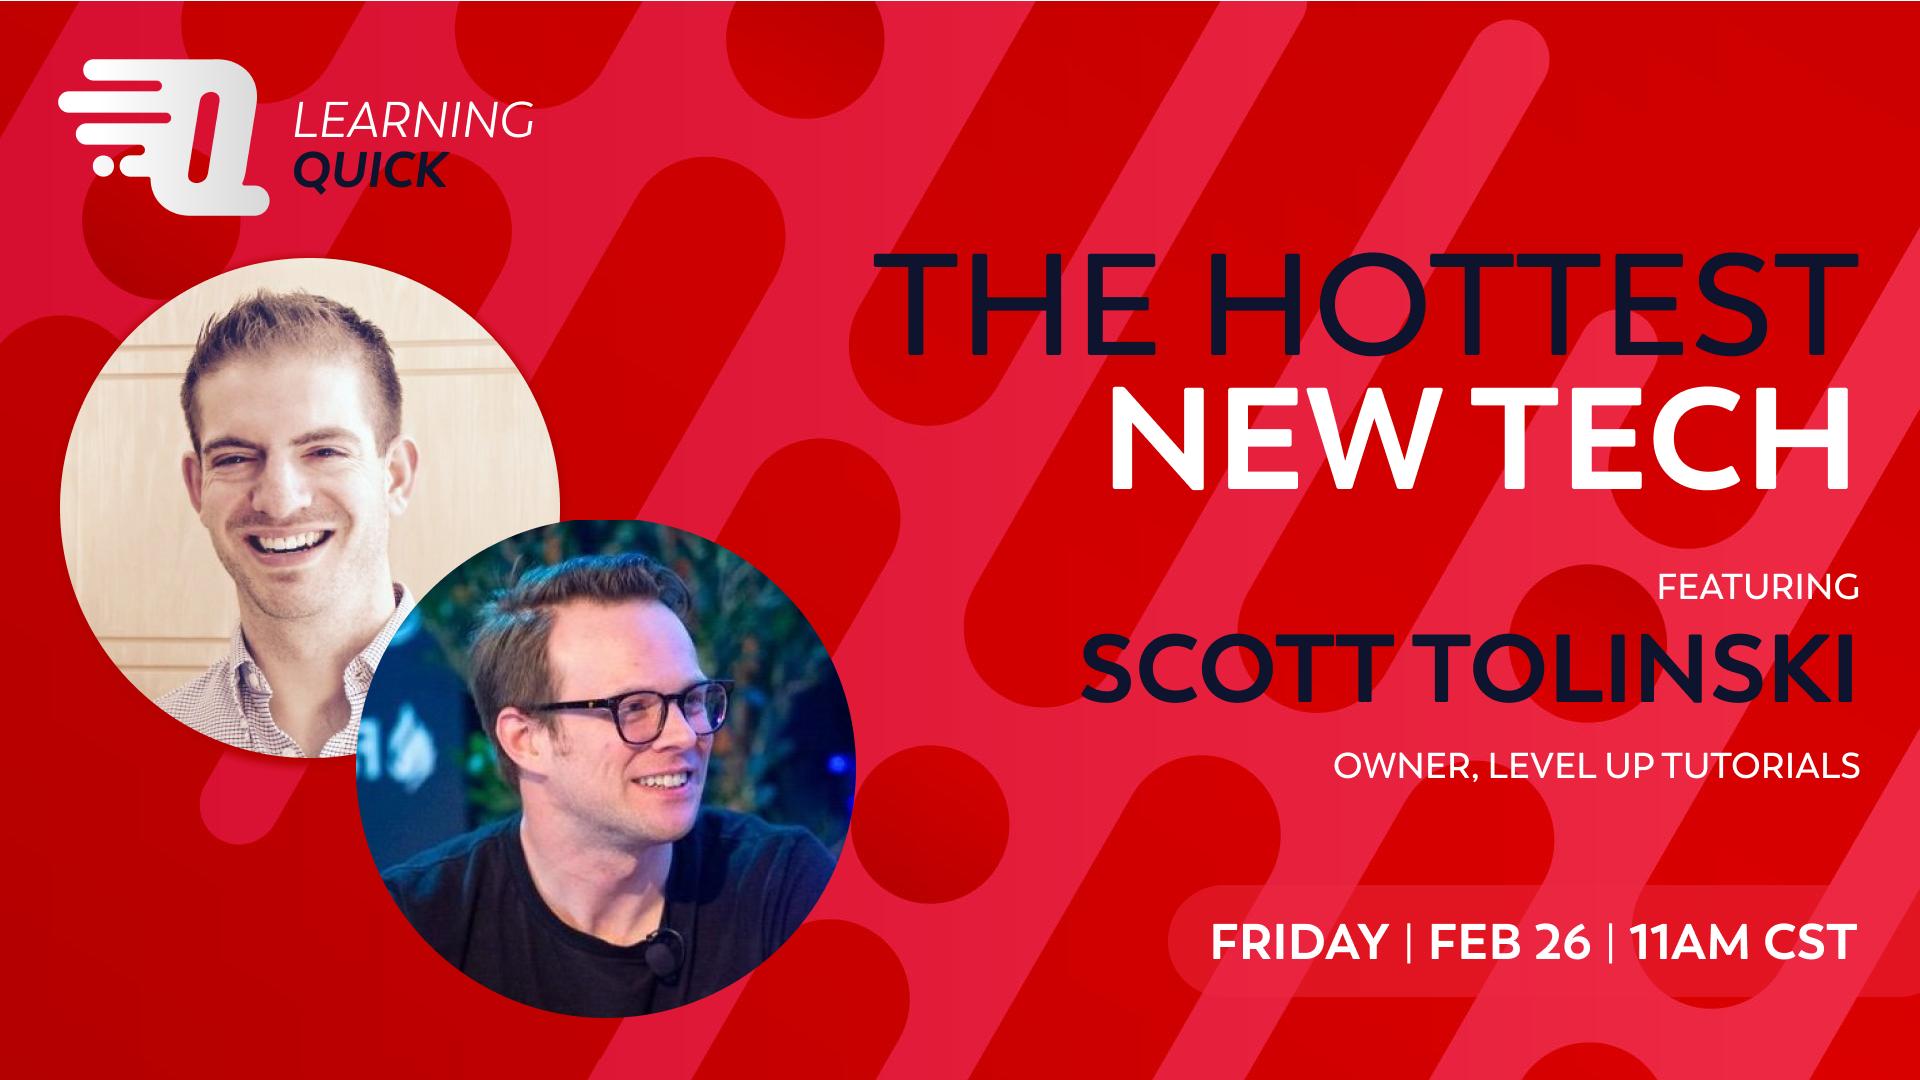 Hot New Tech with Scott Tolinski